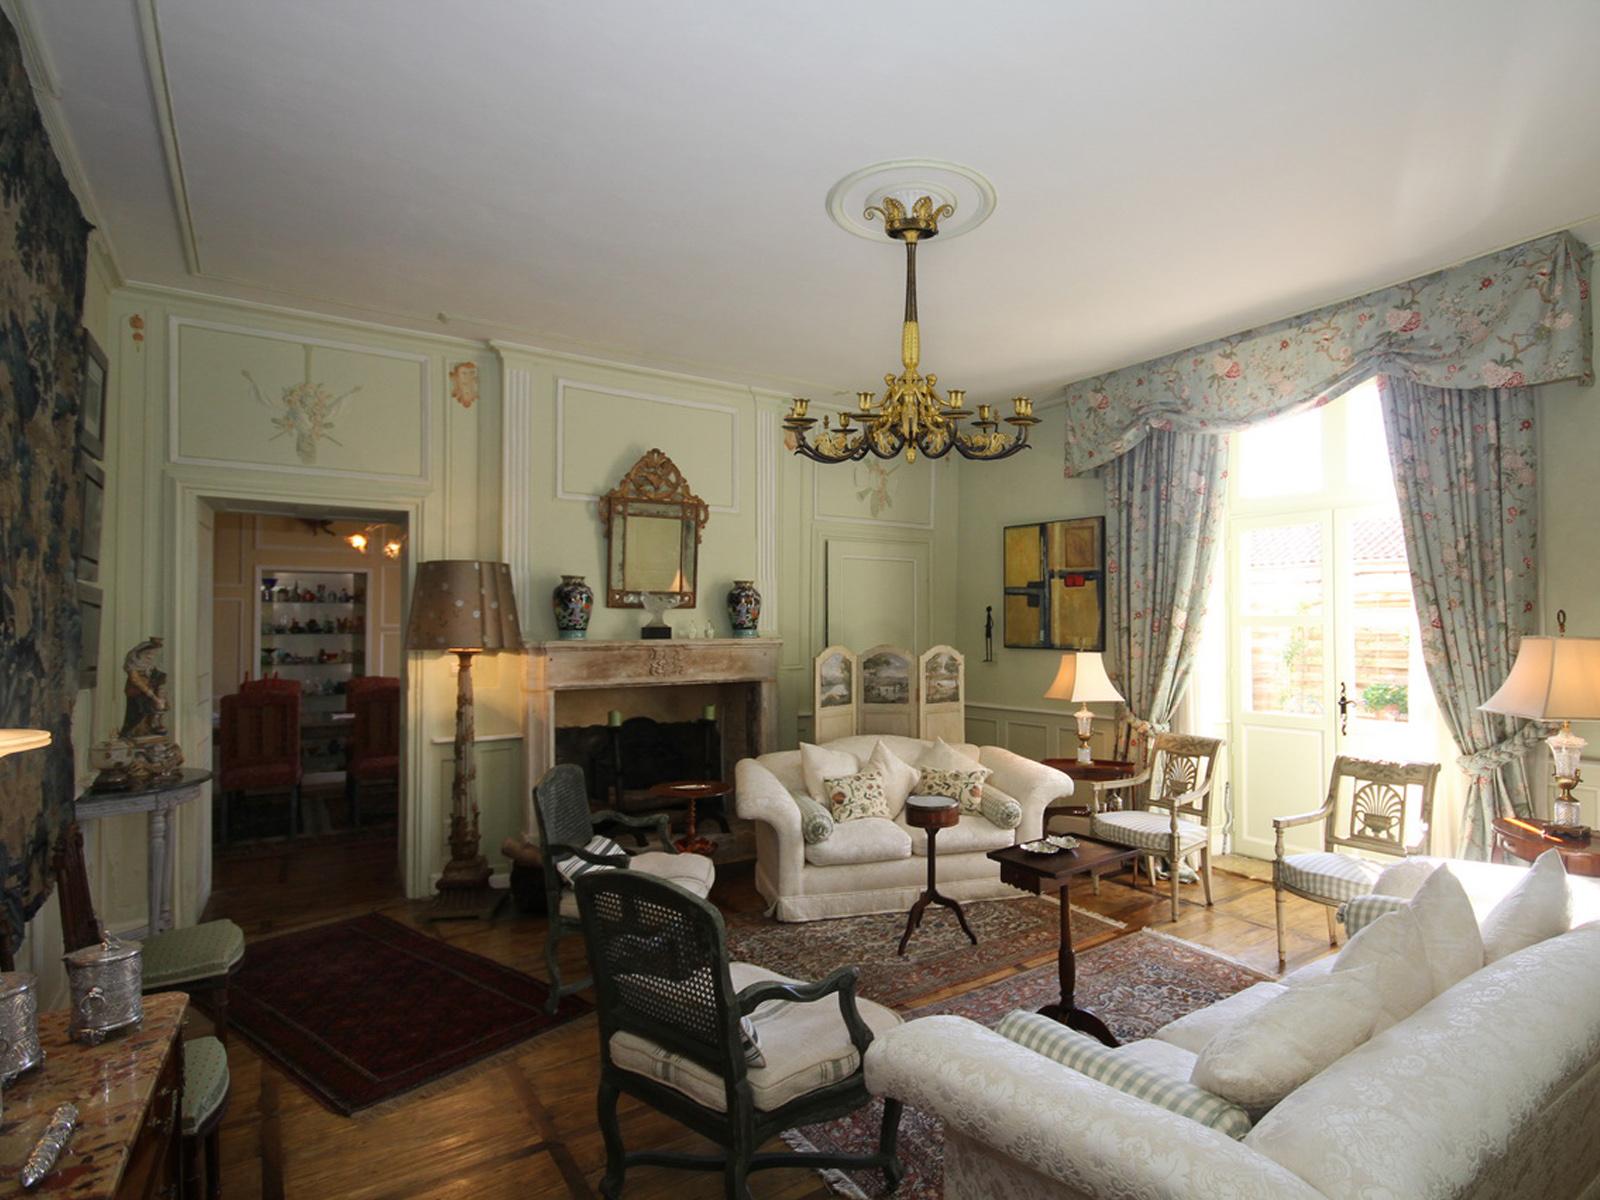 Property Of VILLAGE HOUSE 18th CENTURY, SAINT CYPRIEN